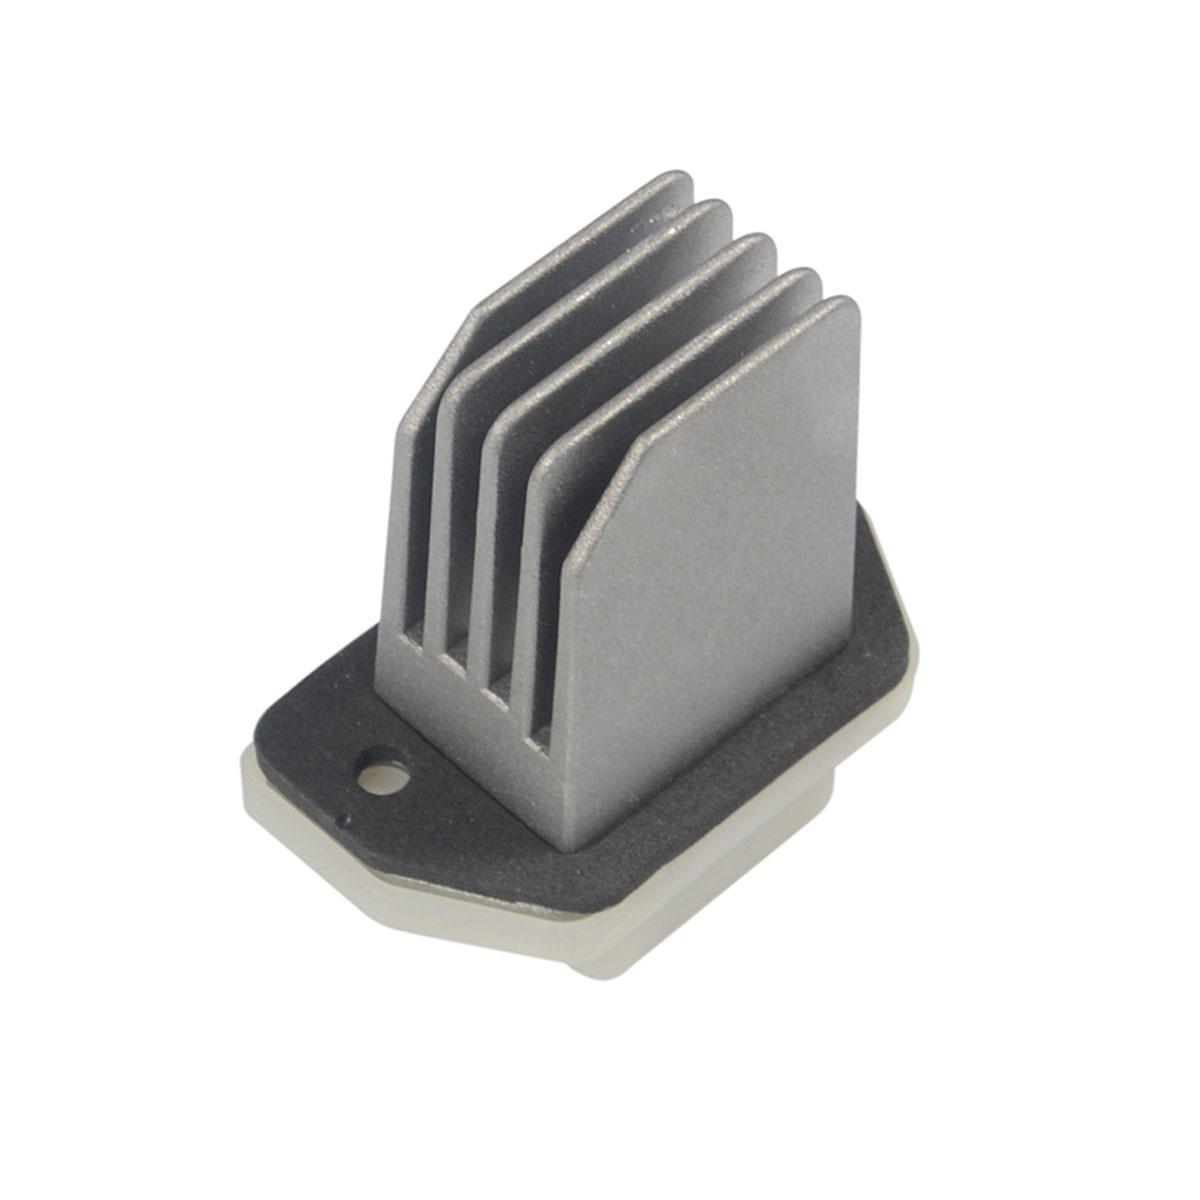 A//C Heater Blower Motor Resistor for Nissan NV1500 NV2500 3500 2012-2013 Sentra